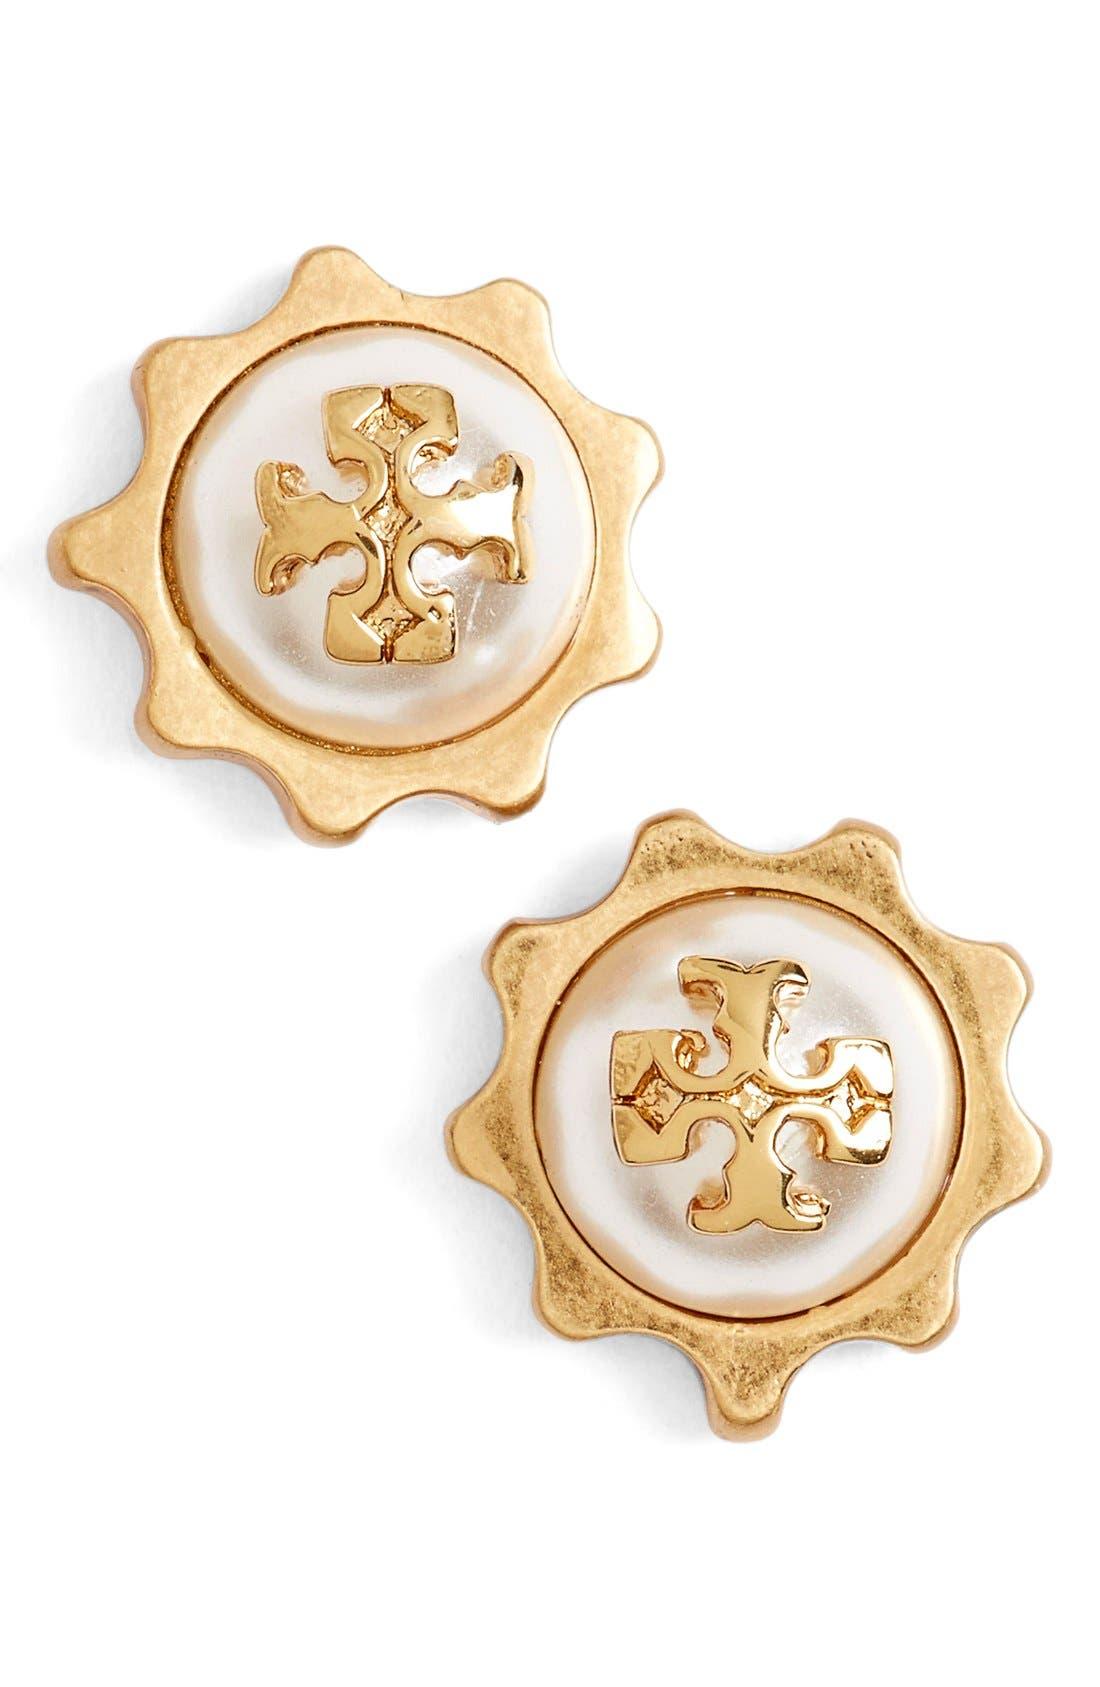 Alternate Image 1 Selected - Tory Burch Logo Faux Pearl Gear Stud Earrings